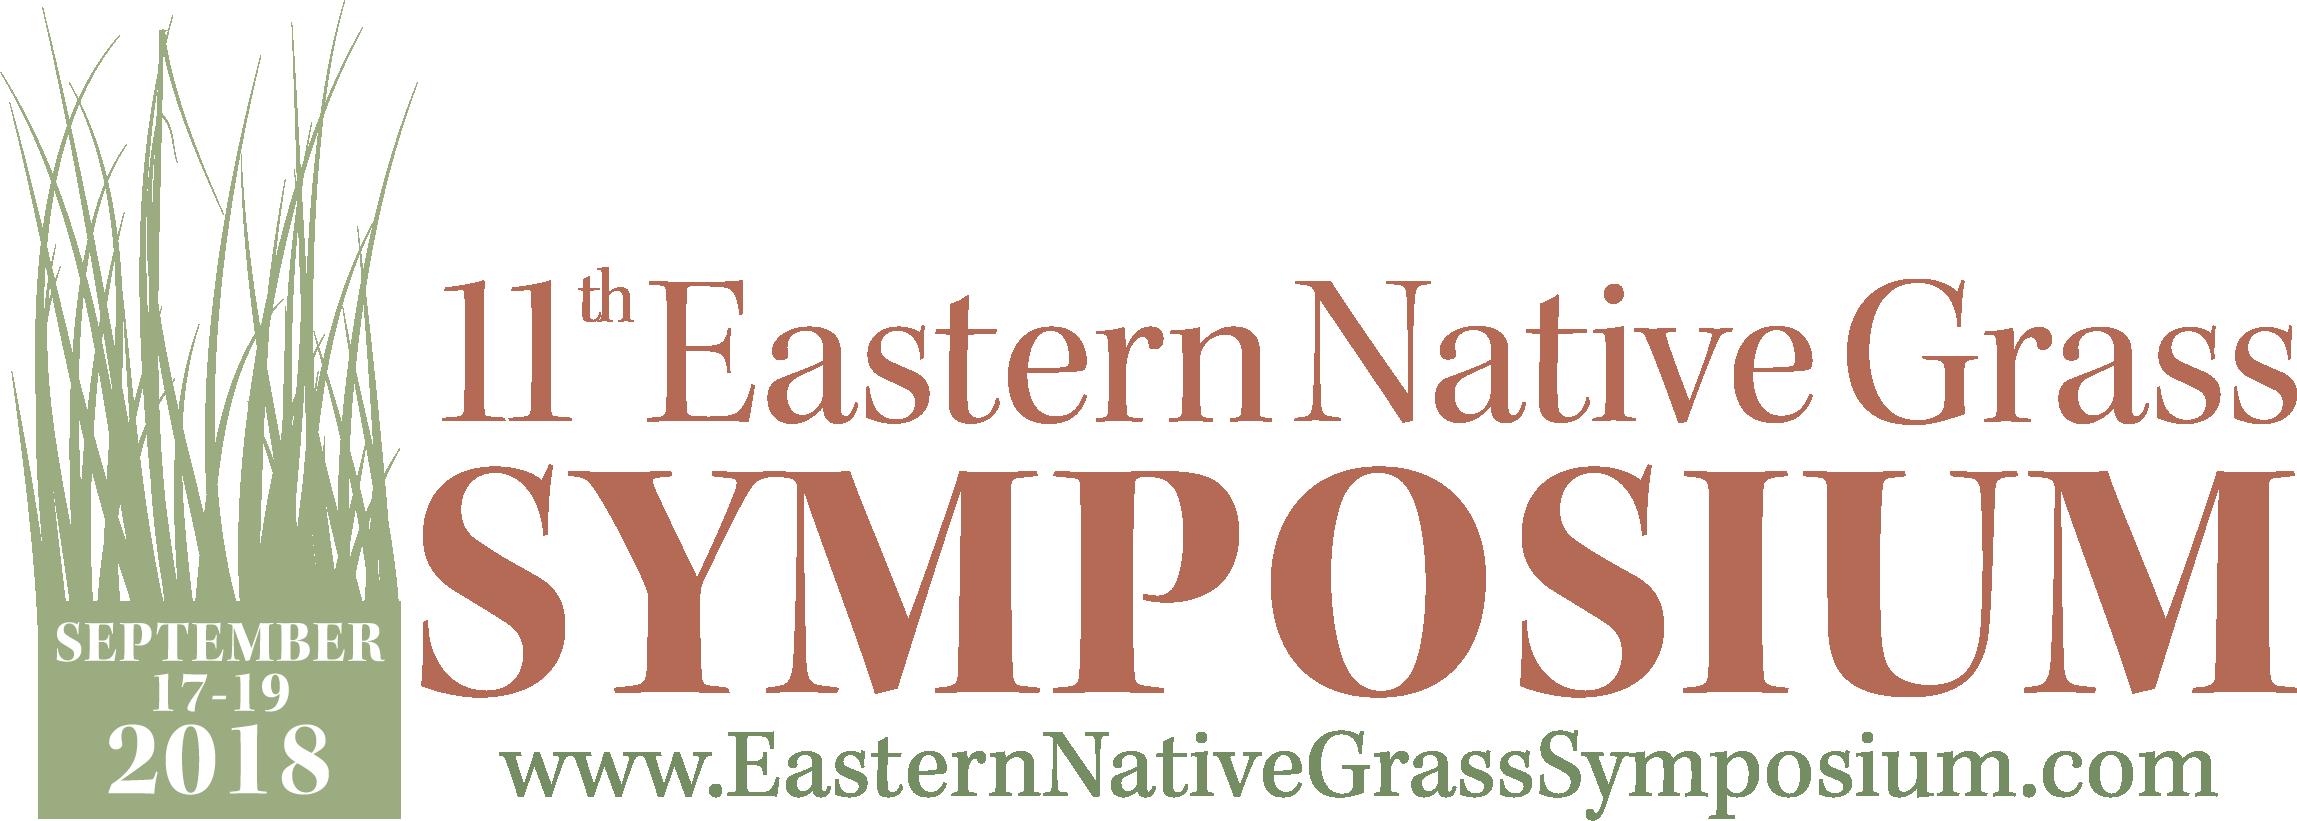 Eastern-Native-Grass-Symposium-Logo.png